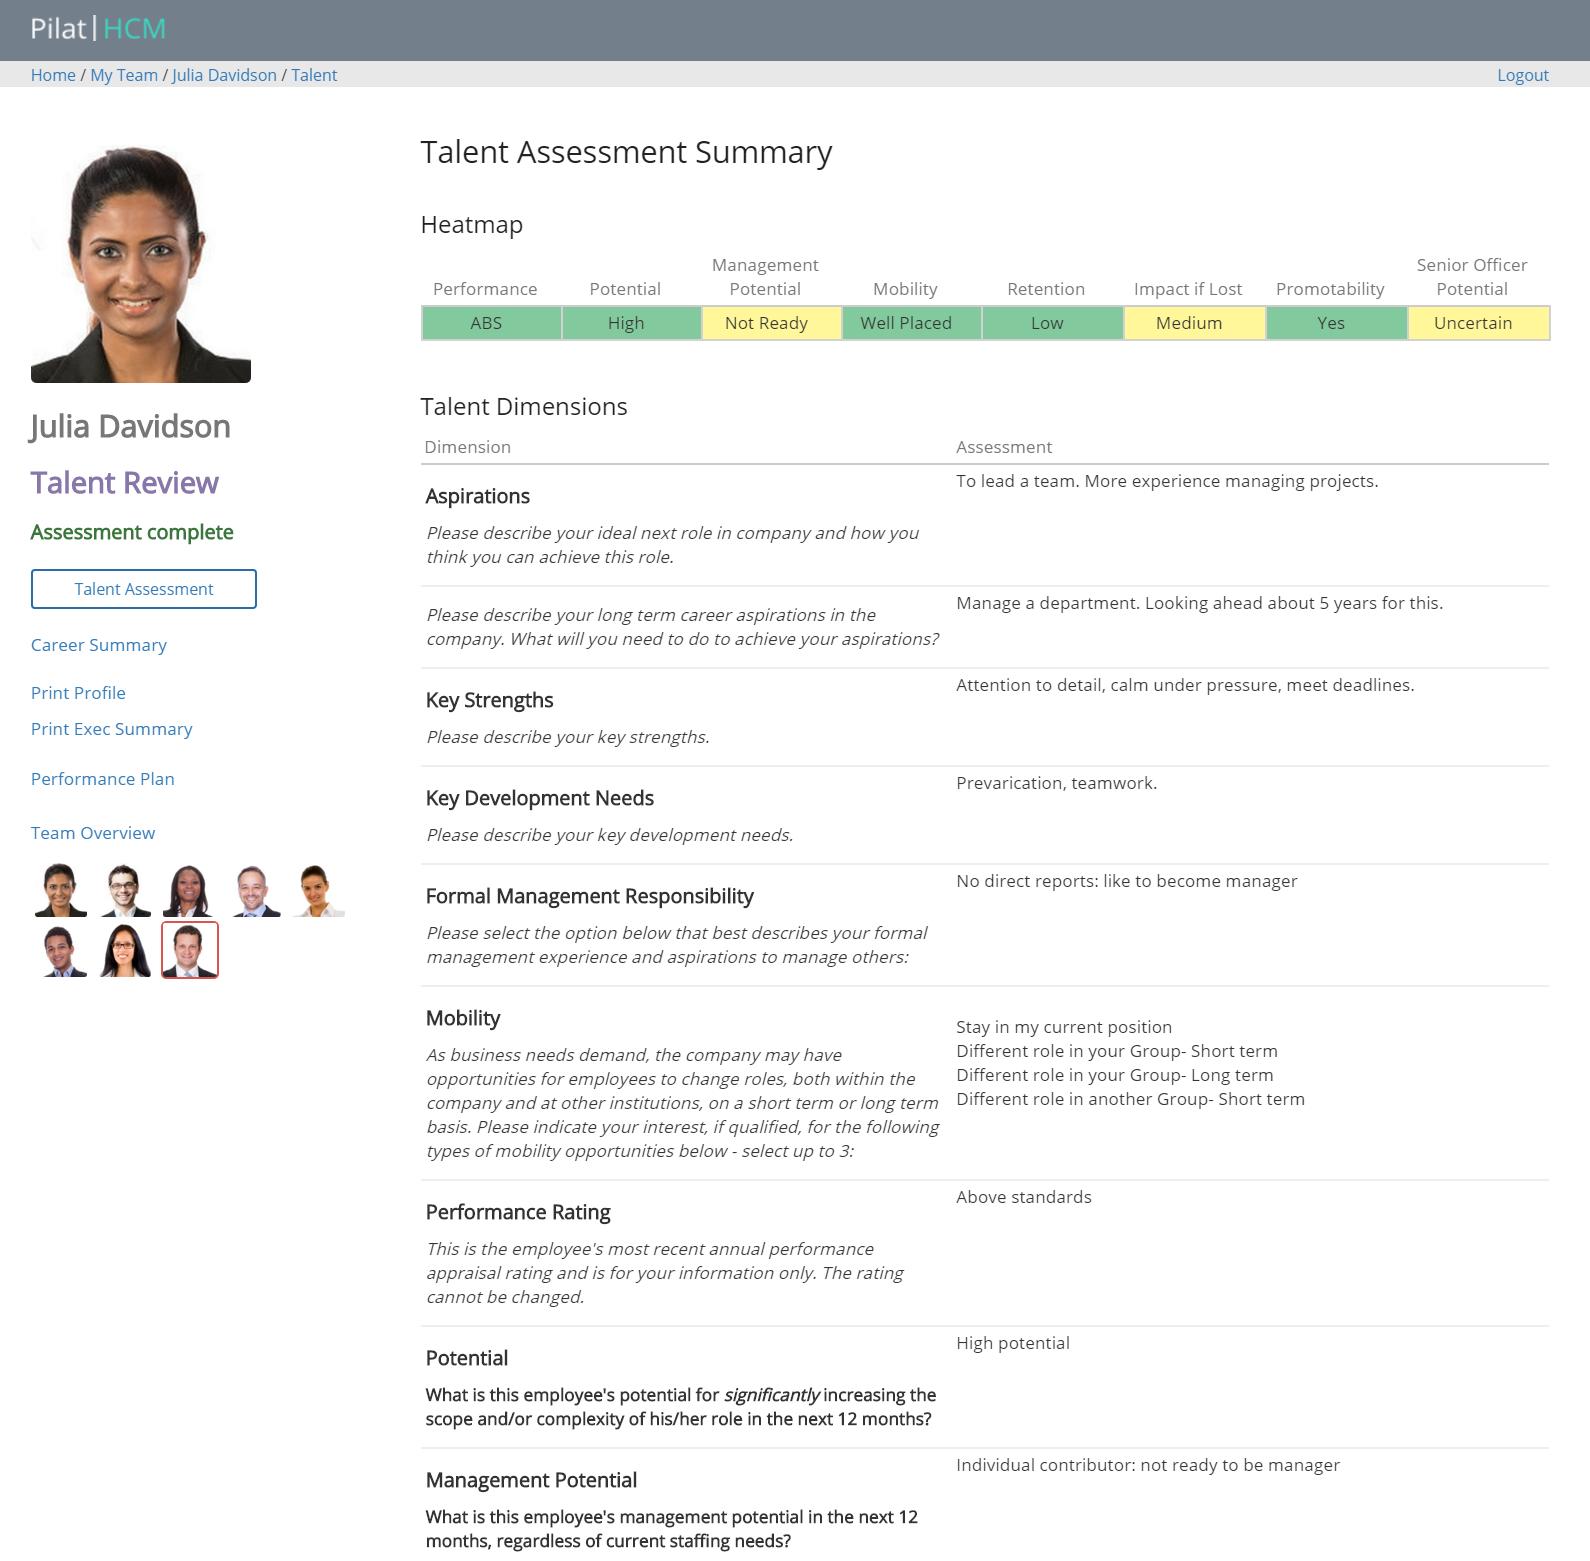 Talent Assessment Summary